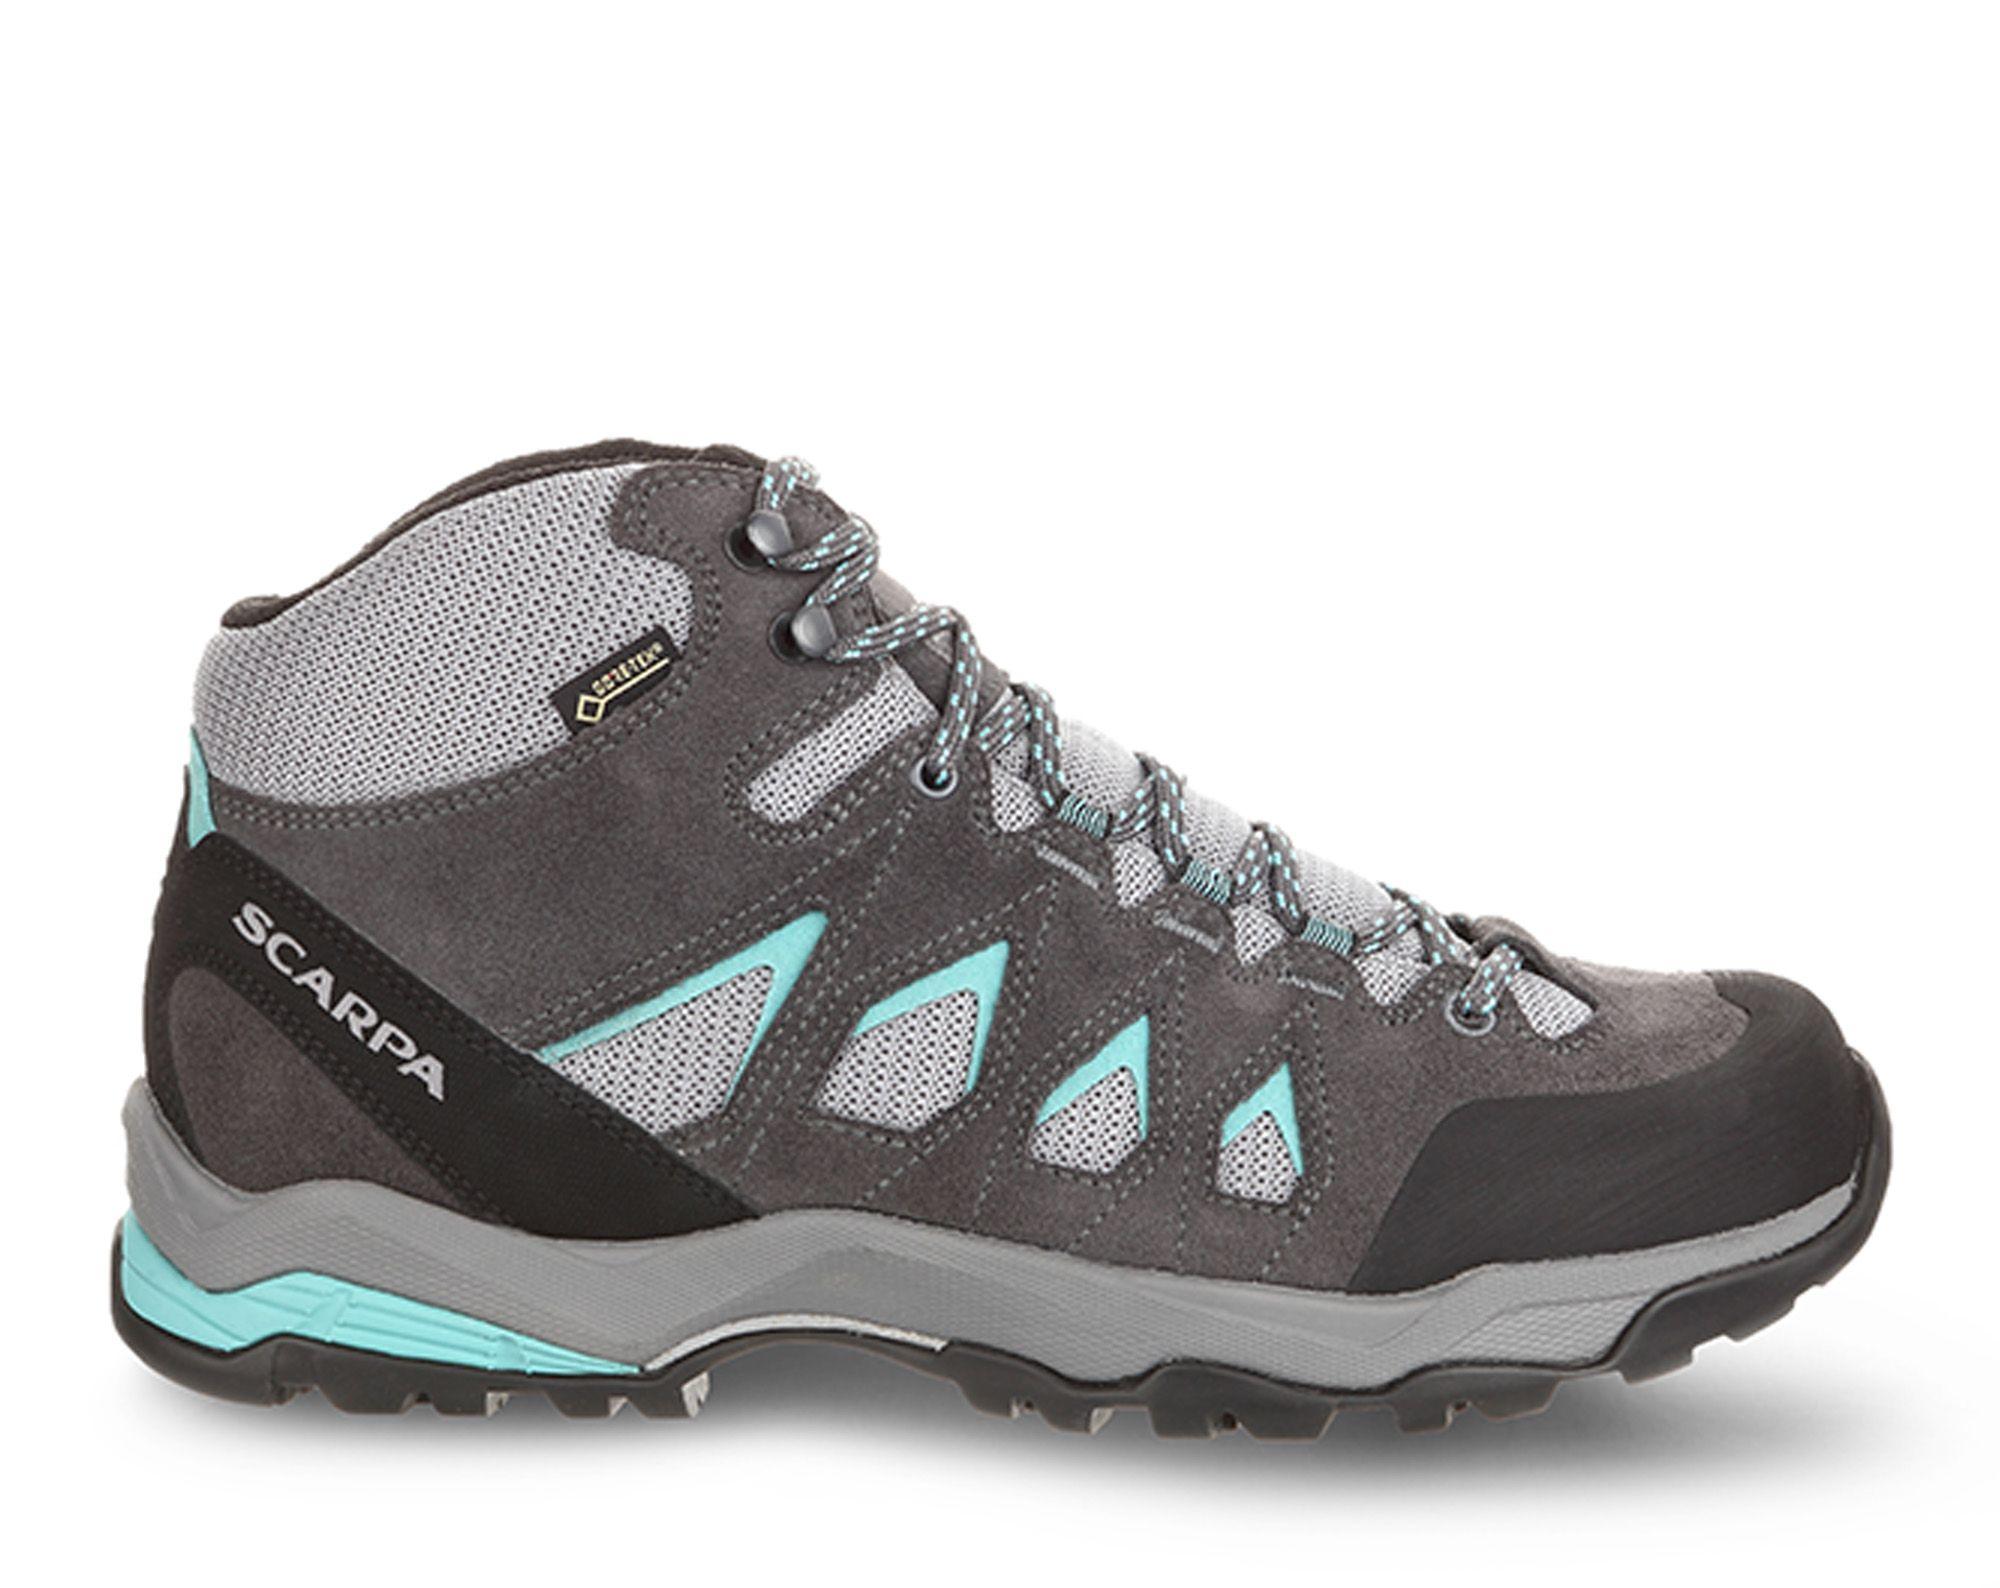 5ca01fc9512 Scarpa Moraine Mid GTX Hiking Shoes, Women's